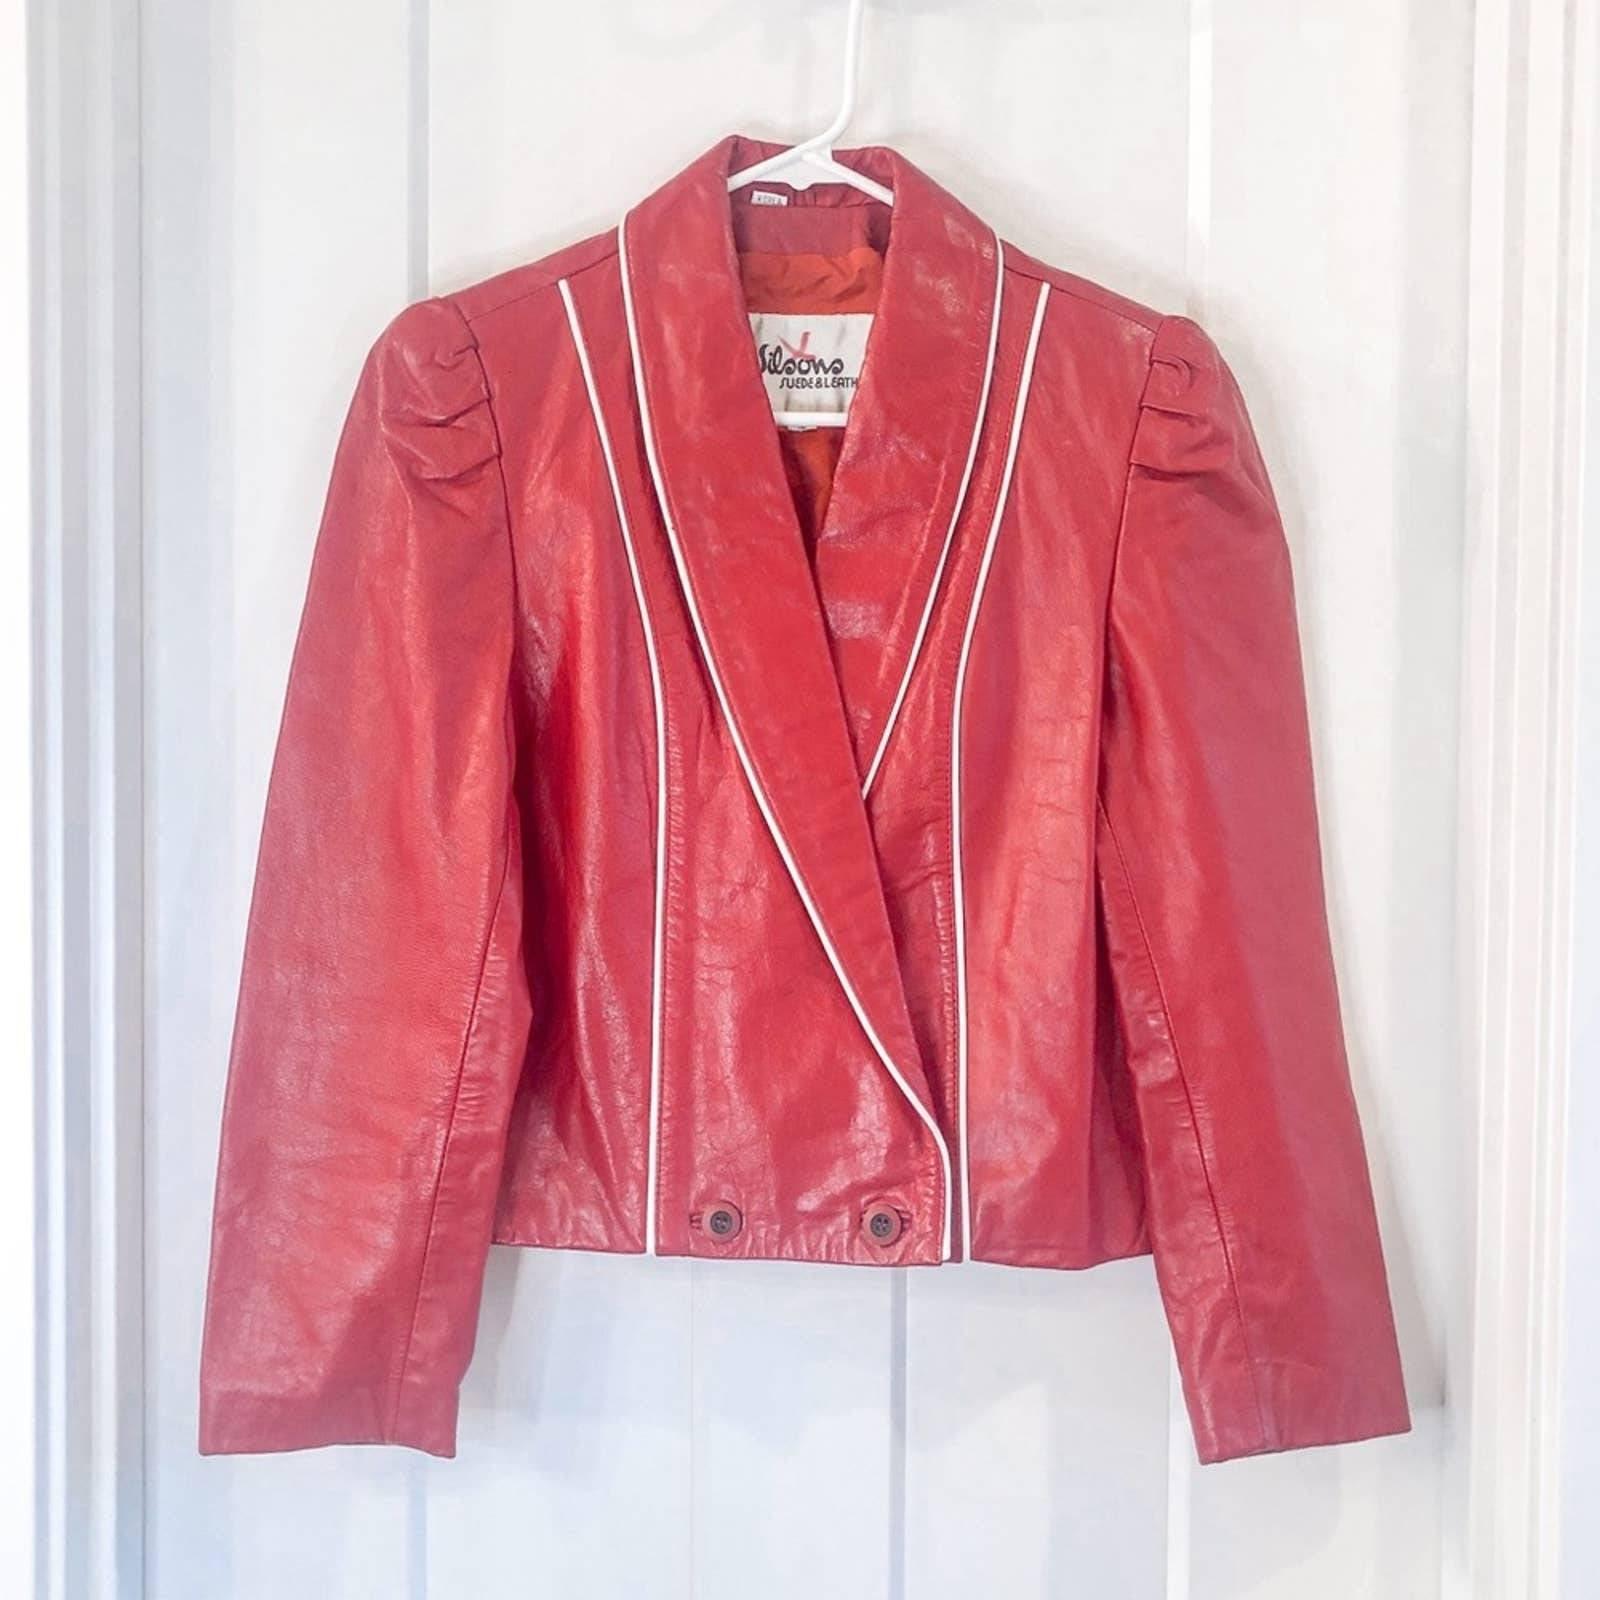 Wilsons Leather Vintage Red Jacket 12